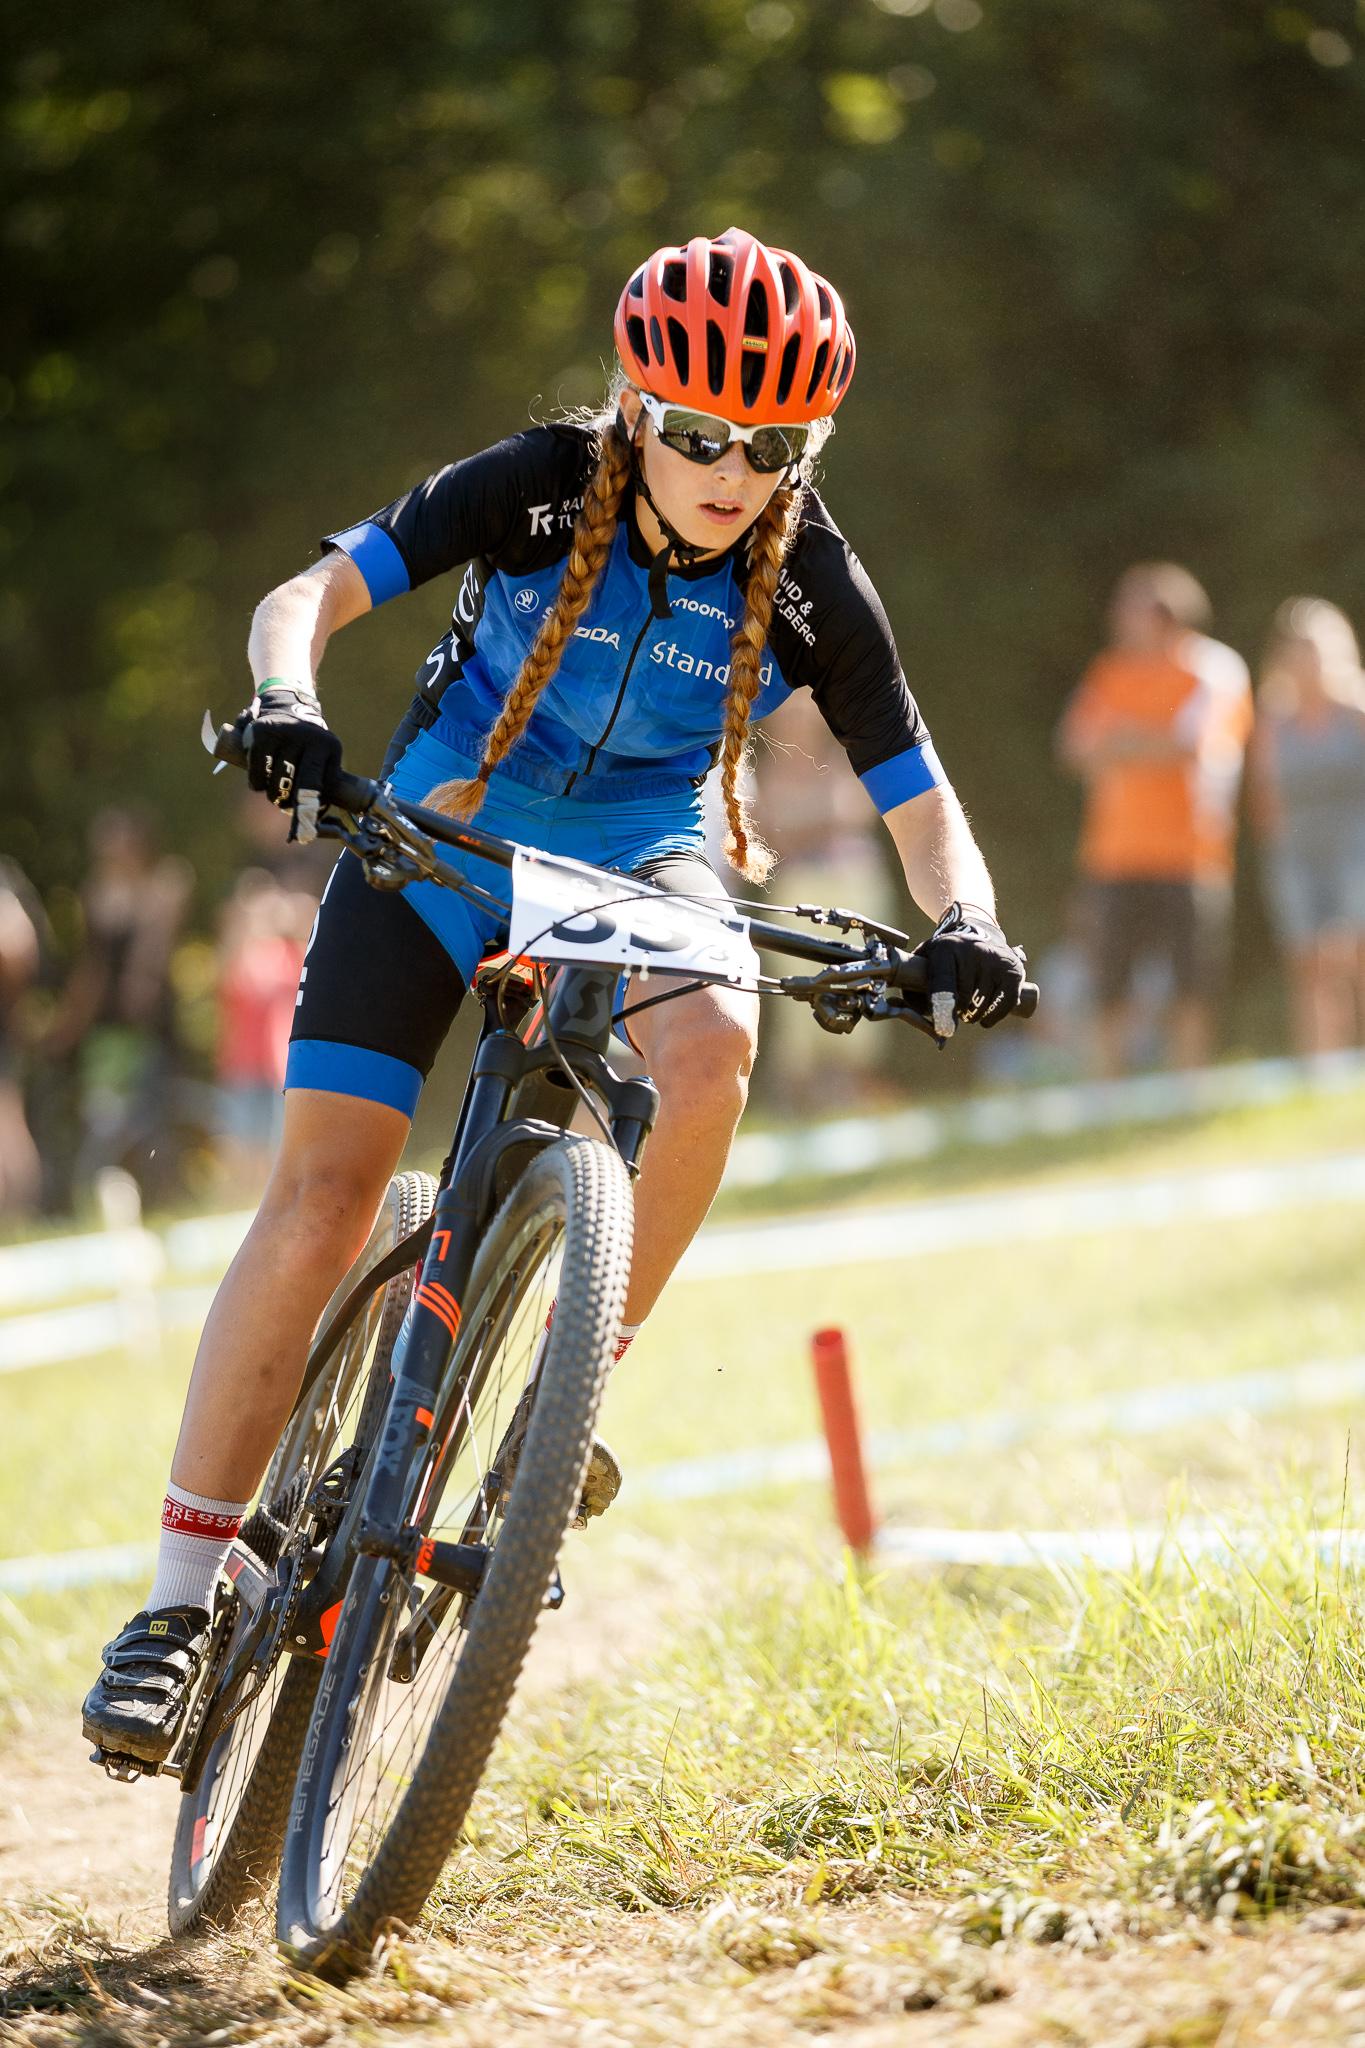 mountainbike-portrait-european-championchip-graz_90R4572.jpg